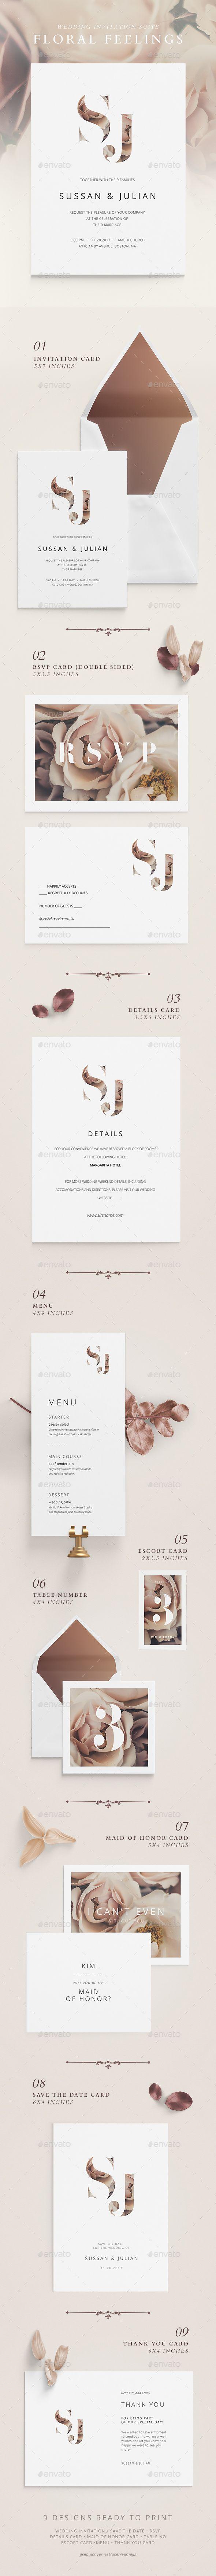 Best Wedding Invitation Template Design Images On Pinterest